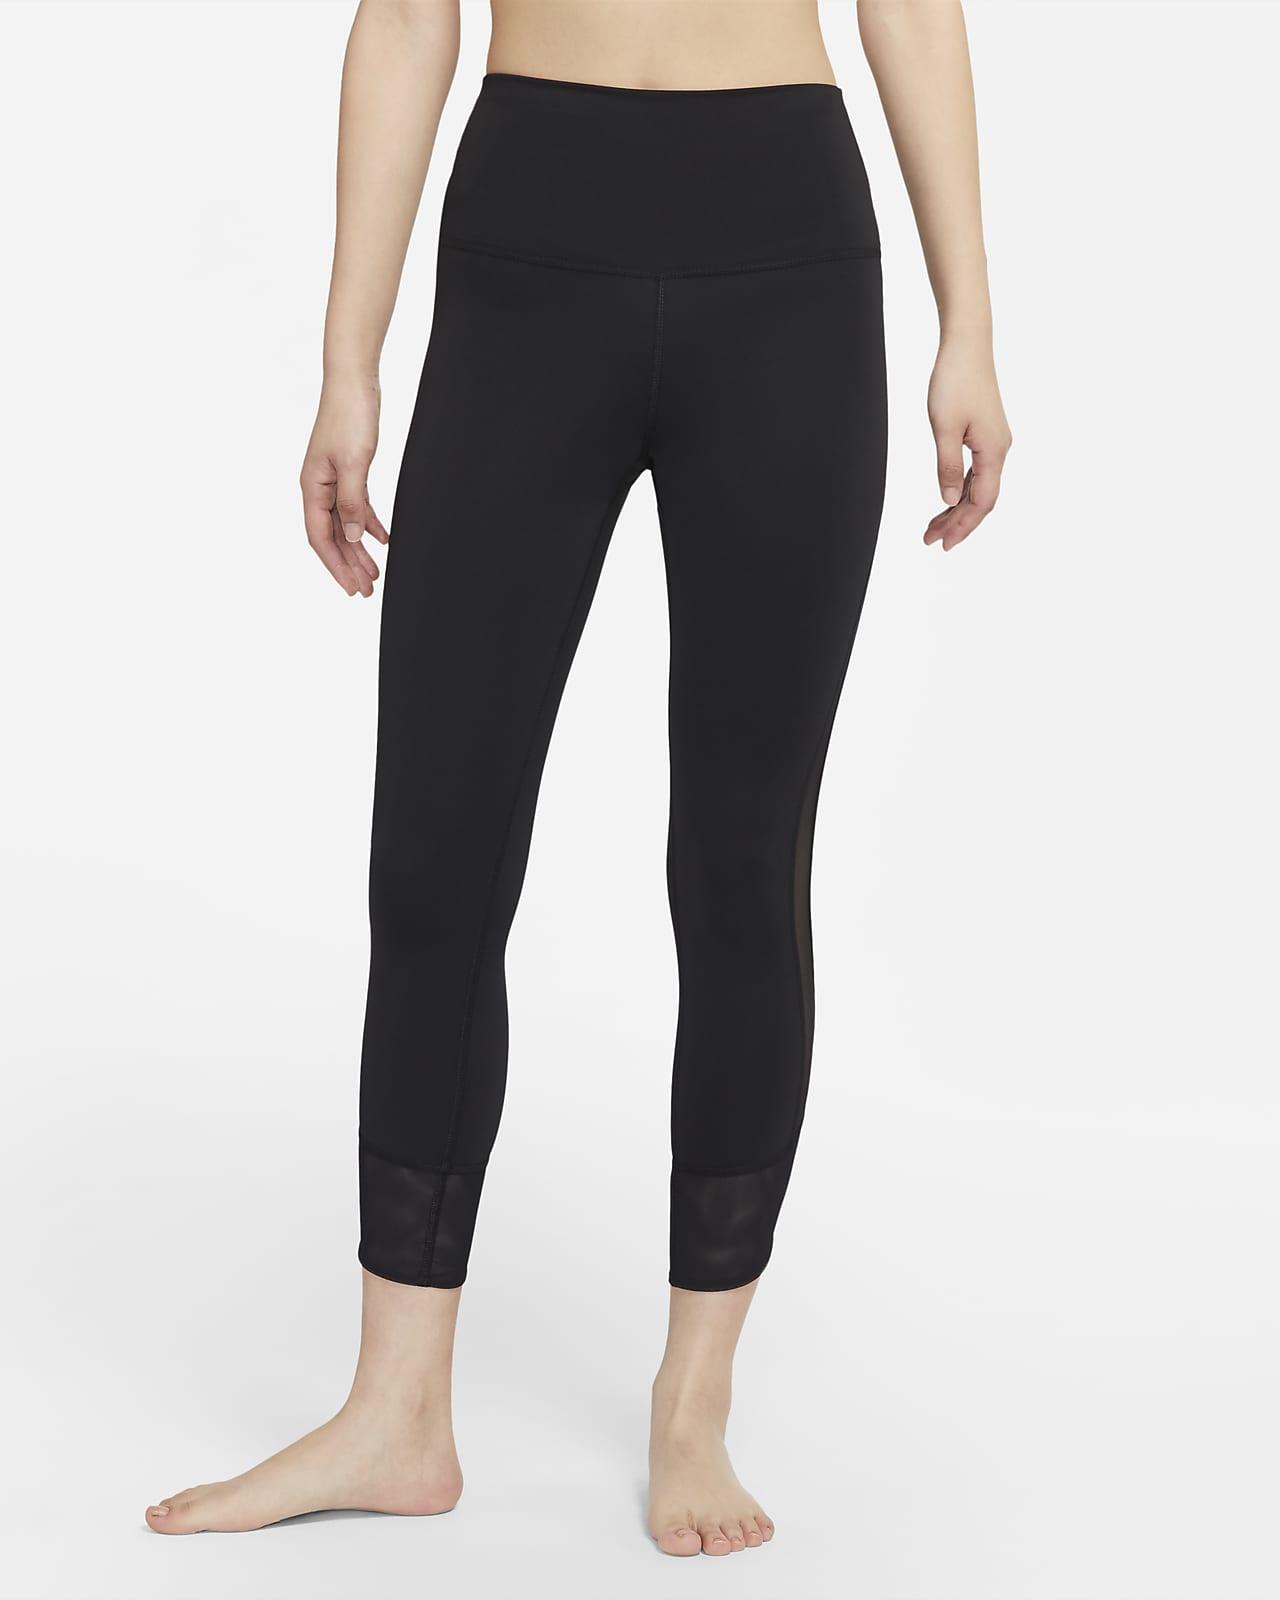 Nike Yoga Dri-FIT Women's High-Waisted 7/8 Mesh Accent Leggings